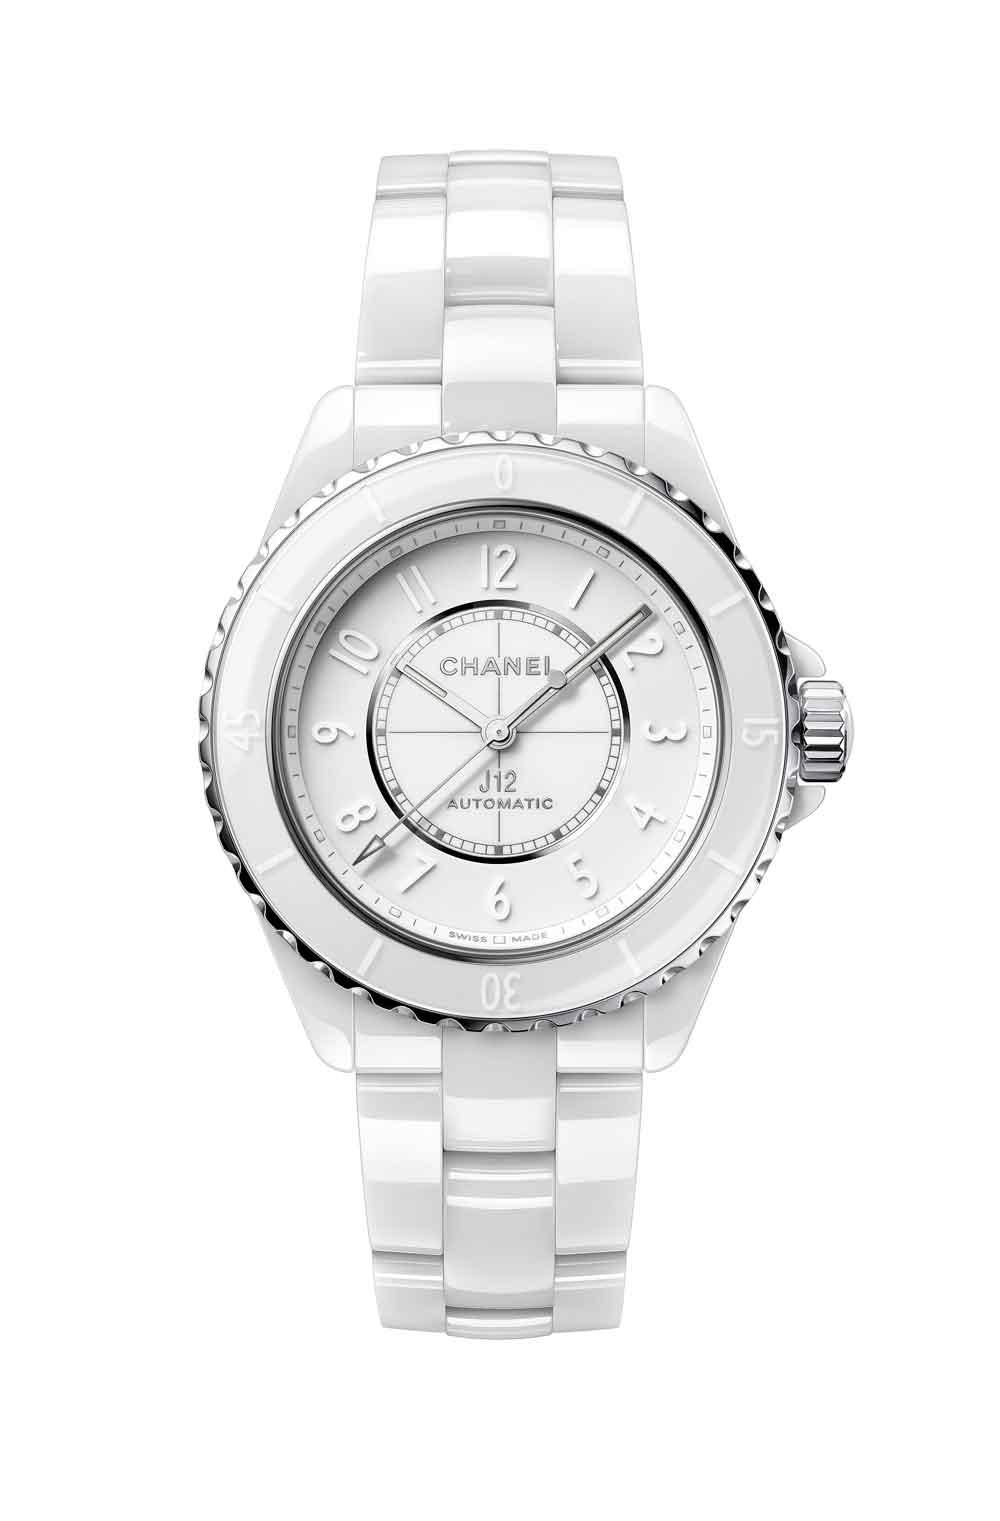 Nuevo reloj Chanel J12 Phantom cerámica blanca